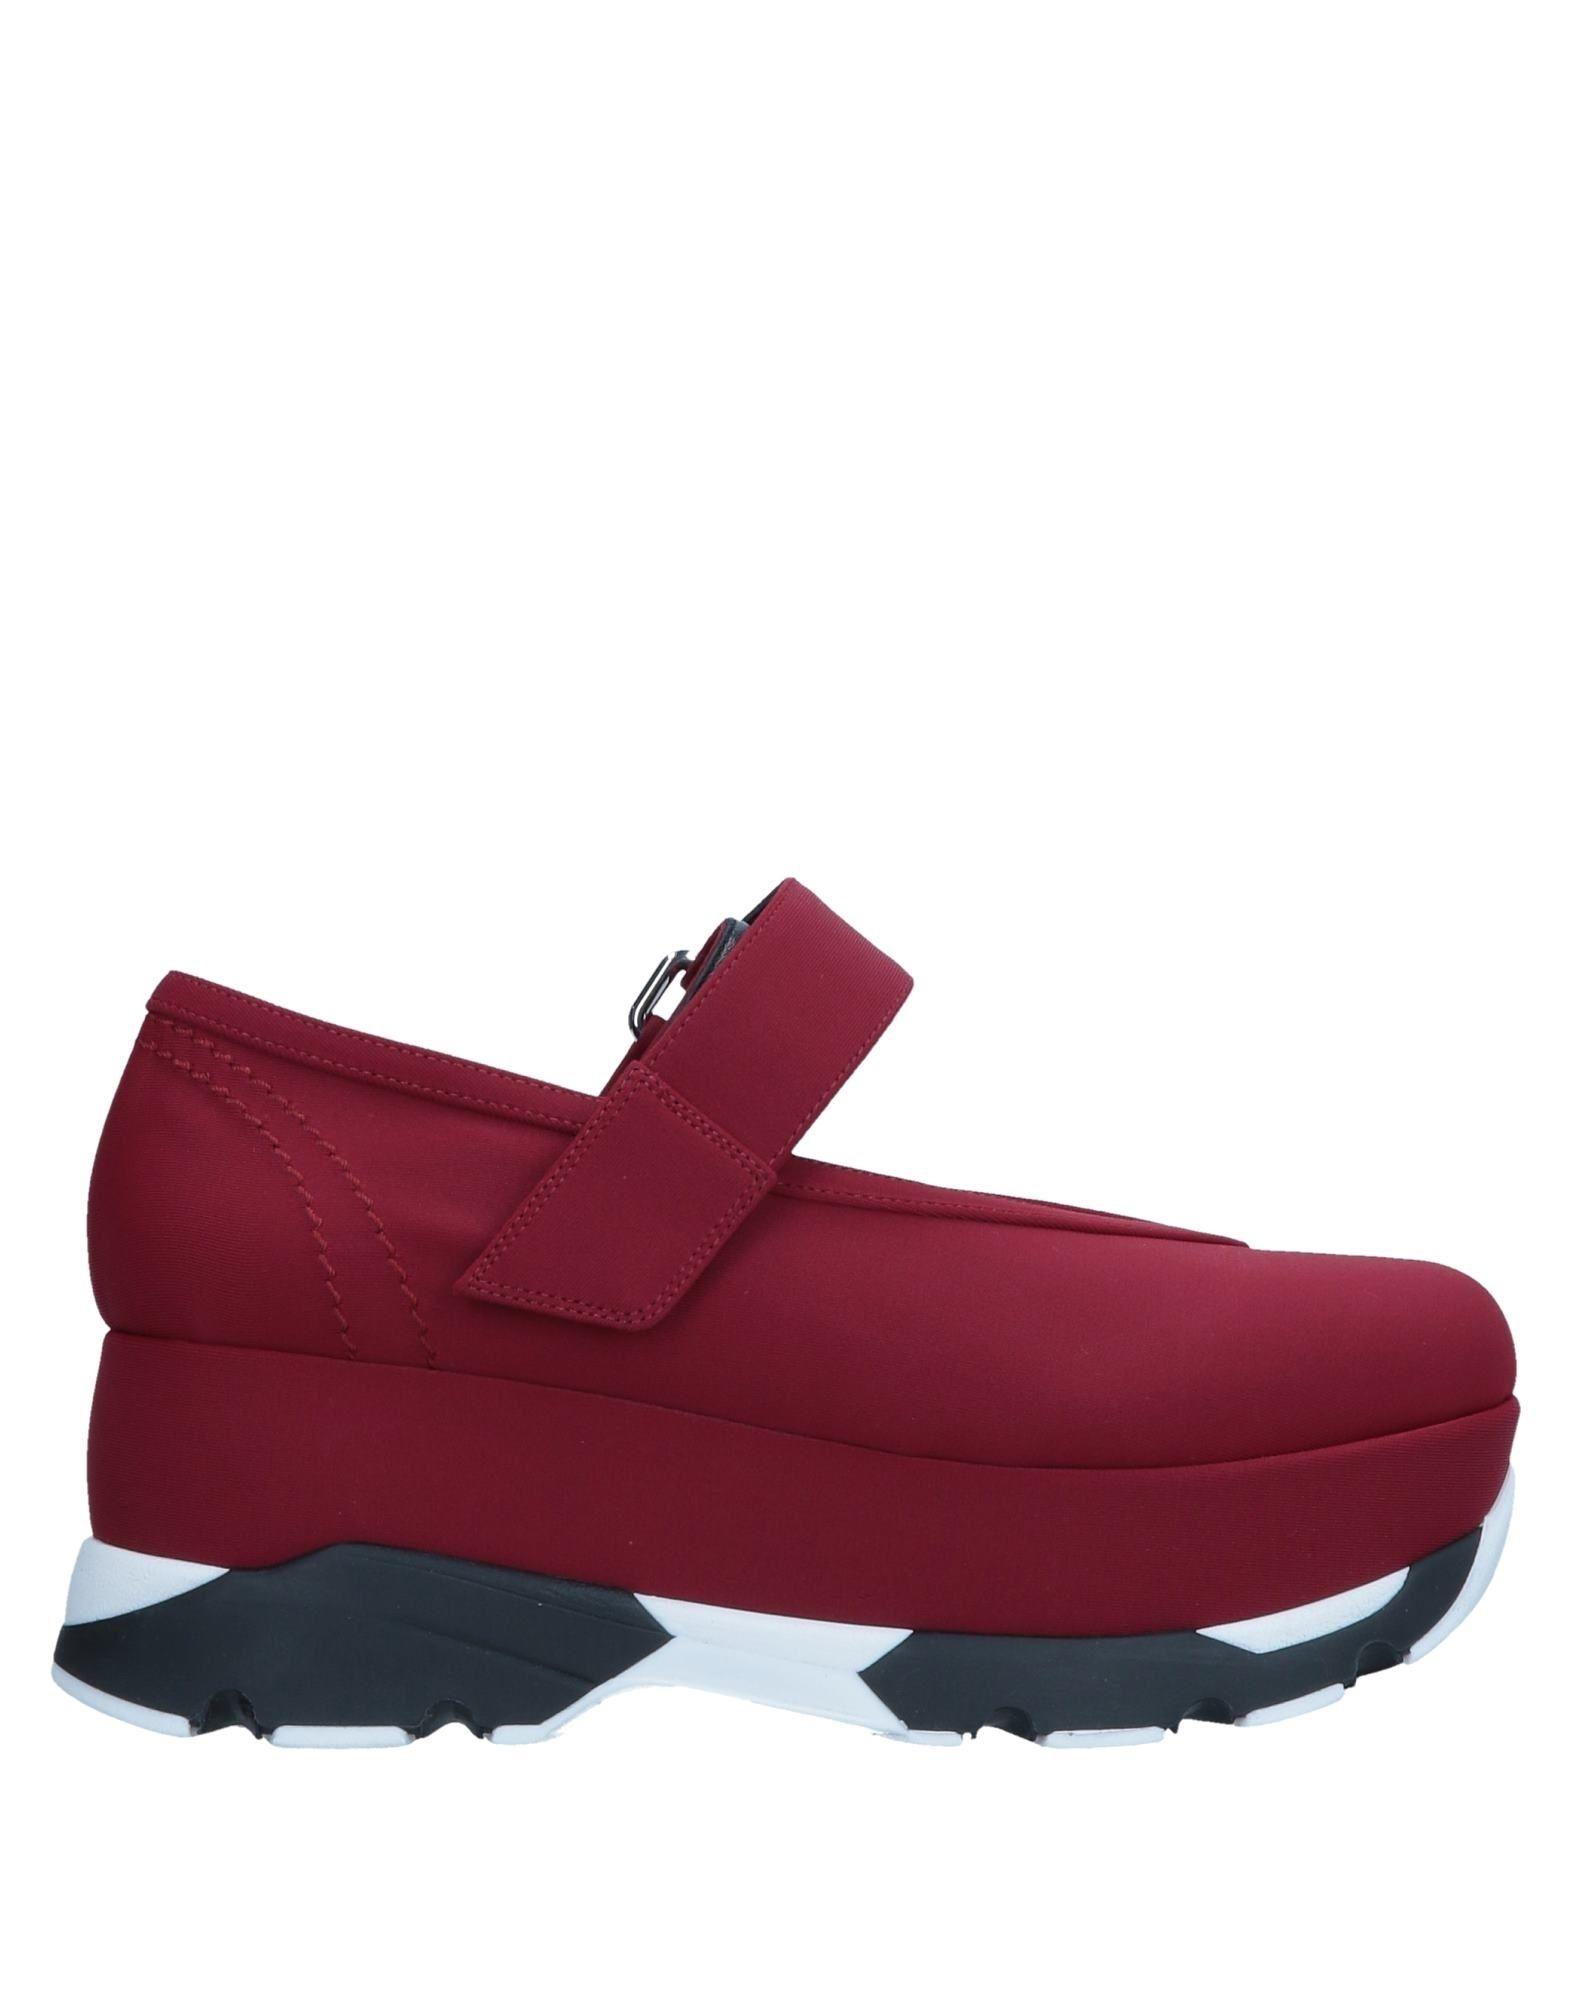 Marni Sneakers Damen  11211729CWGut aussehende strapazierfähige Schuhe